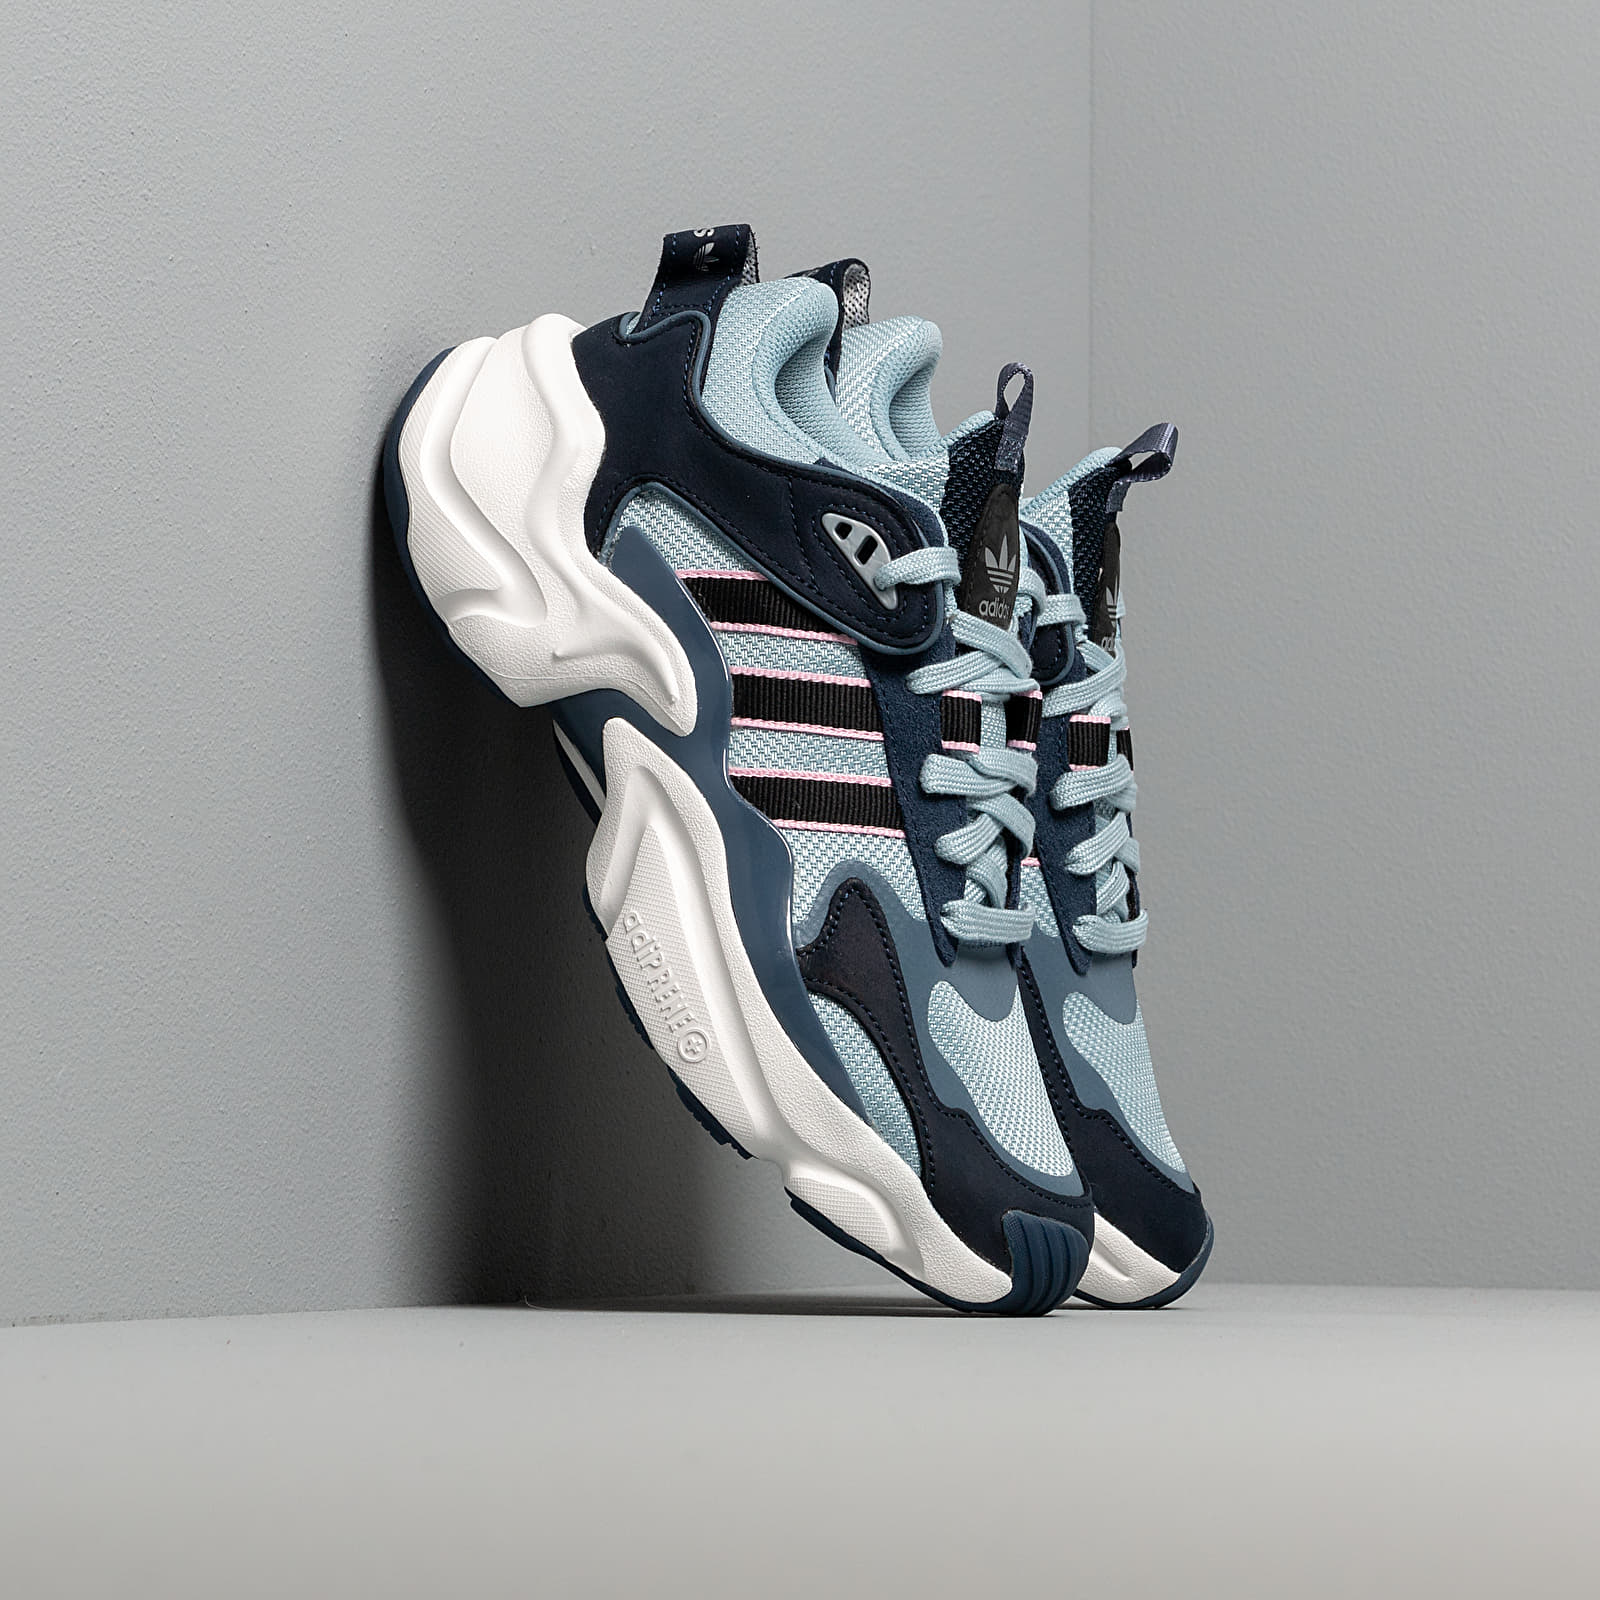 Zapatillas mujer adidas Magmur Runner W Ash Grey/ Core Black/ Tech Ink